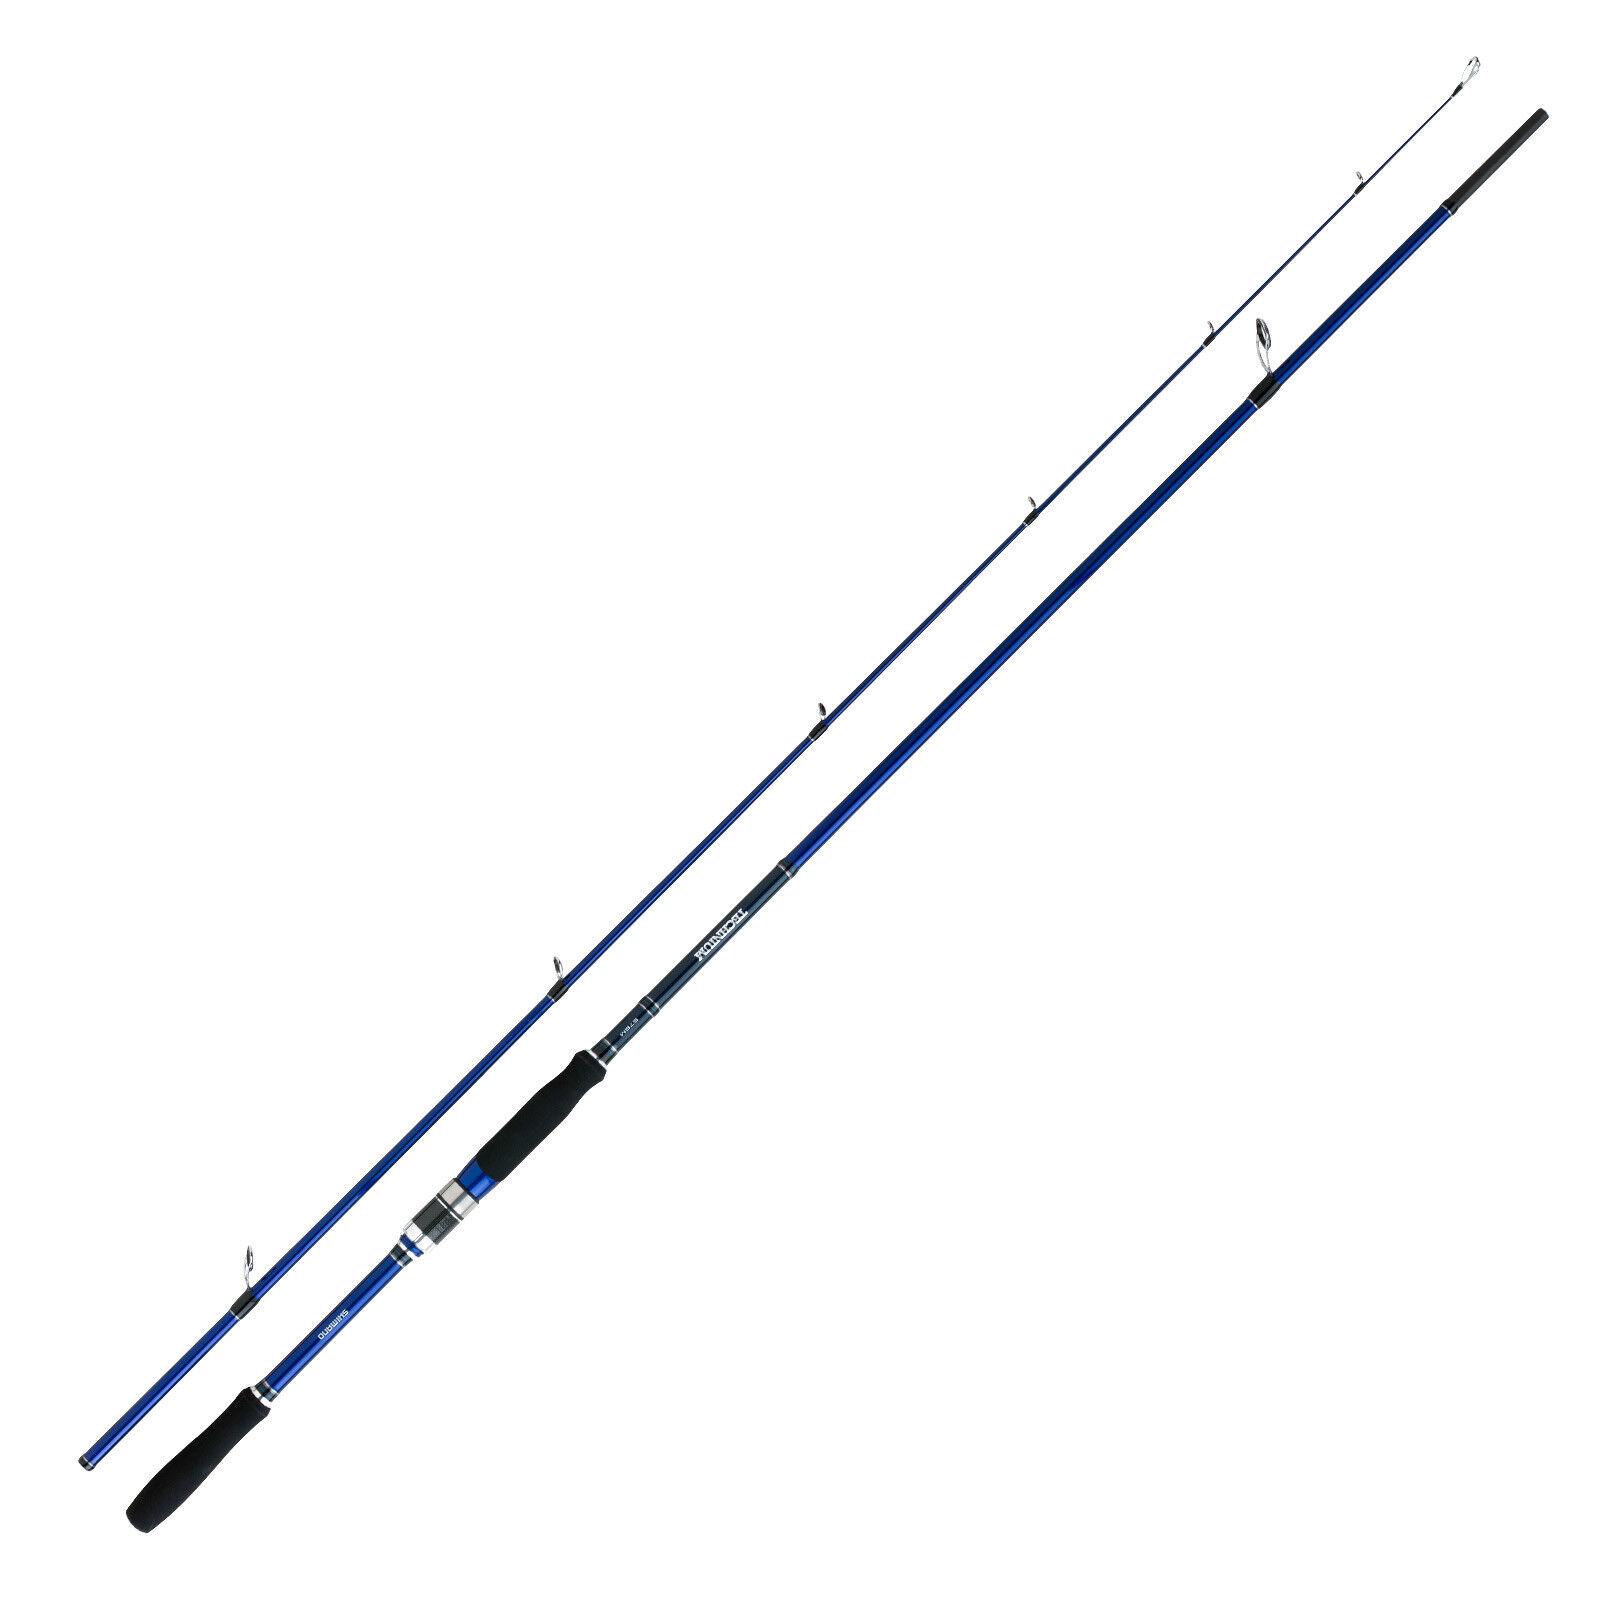 Shimano Canna da pesca a pesca-TECHNIUM spinning 2,34m 7-35g 7-35g 7-35g 2 pezzi STEC 78m 19c4b2